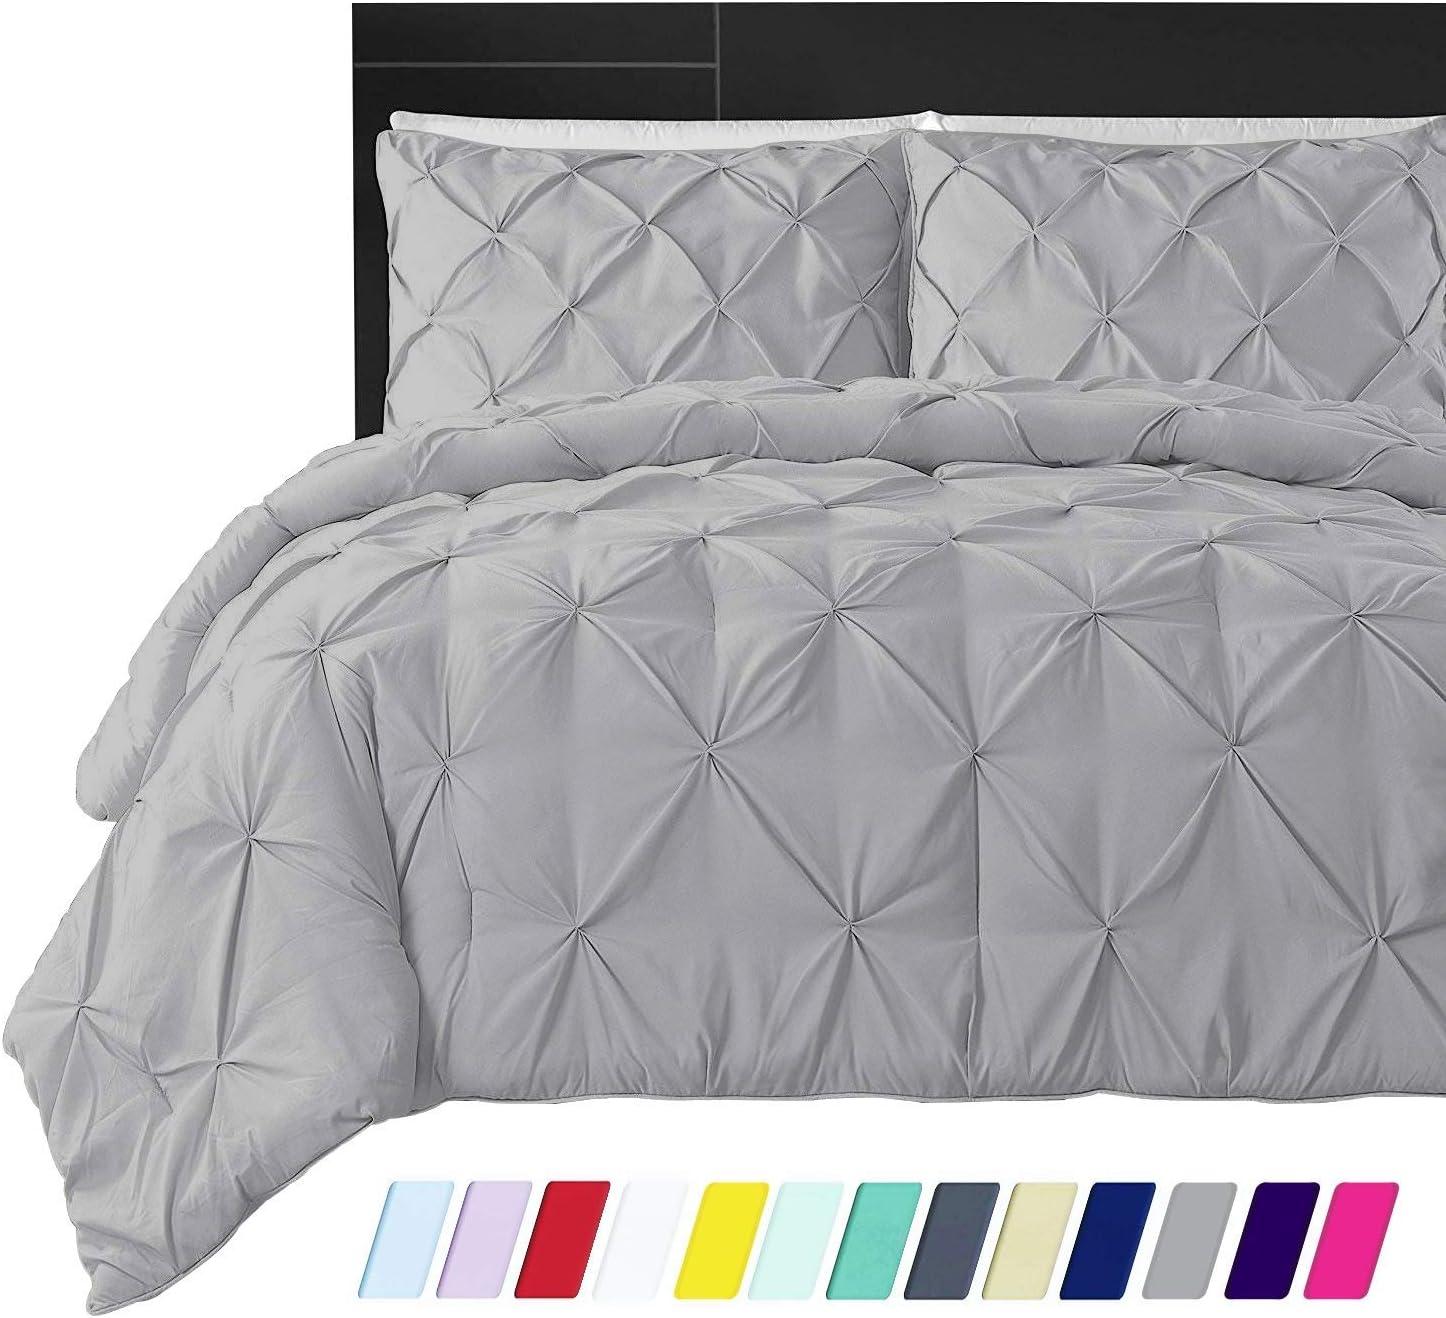 Designer 600 Thread Count Egyptian Cotton 1-PC Duvet Cover with Hidden Zipper Closure /& Corner Ties Solid Twin//Twin XL, Black